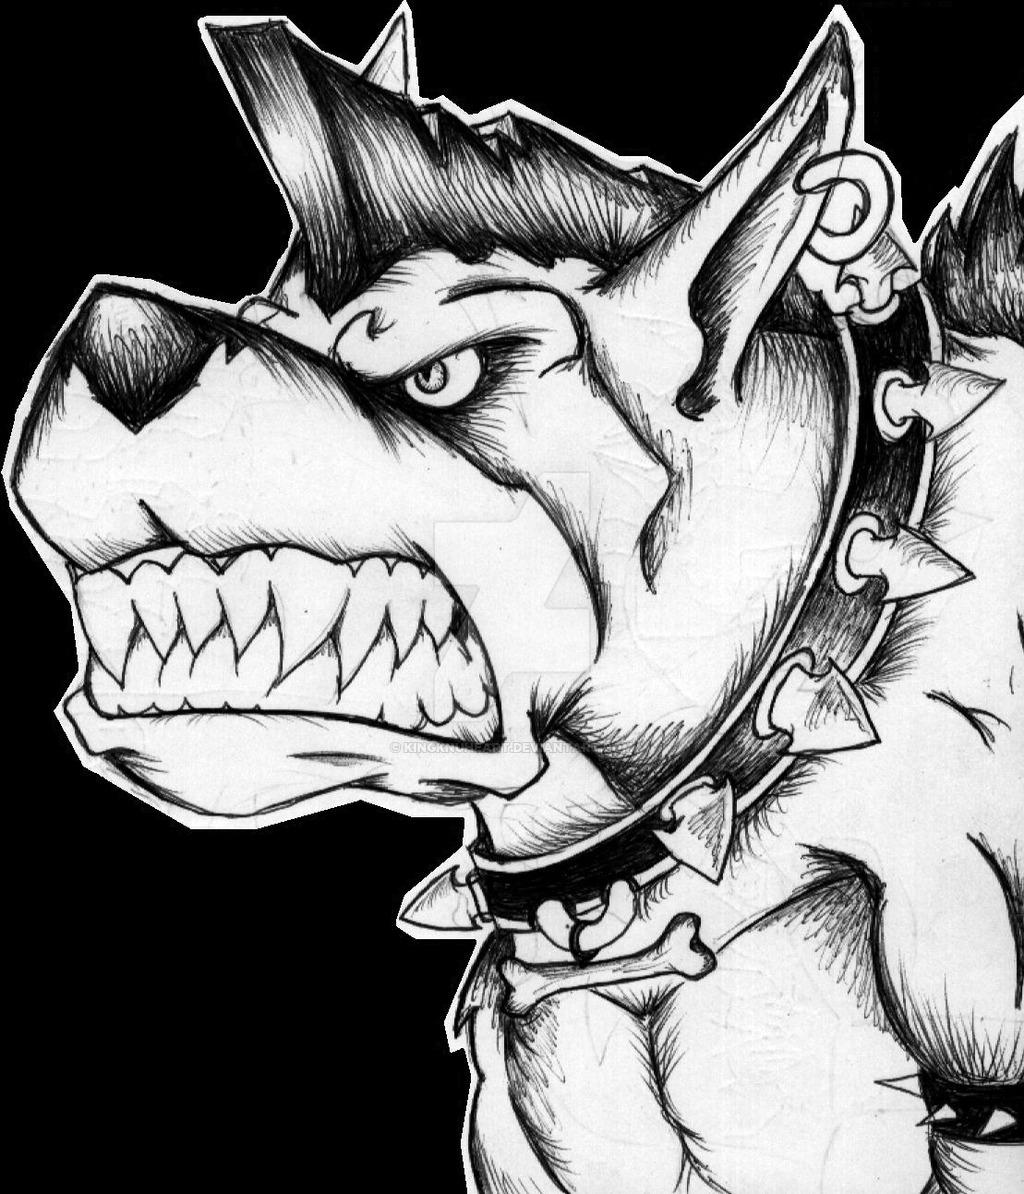 1024x1194 Pitbull Dog Images Drawing